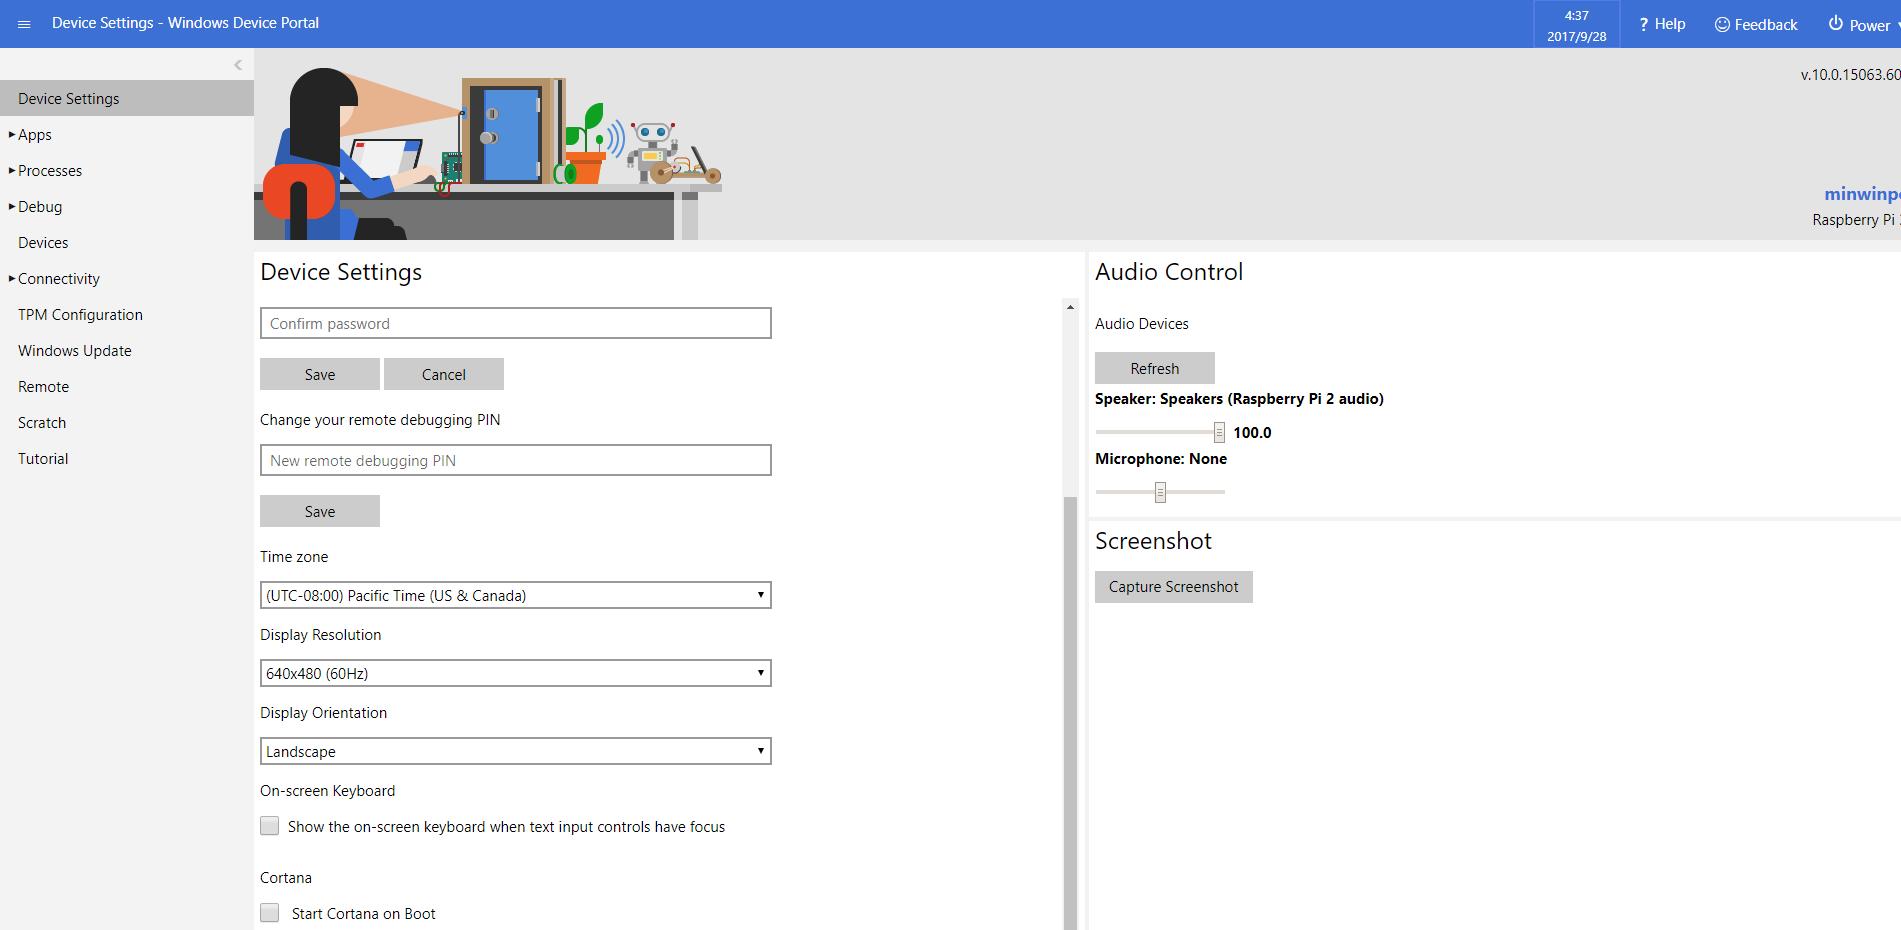 Windows Device Portal